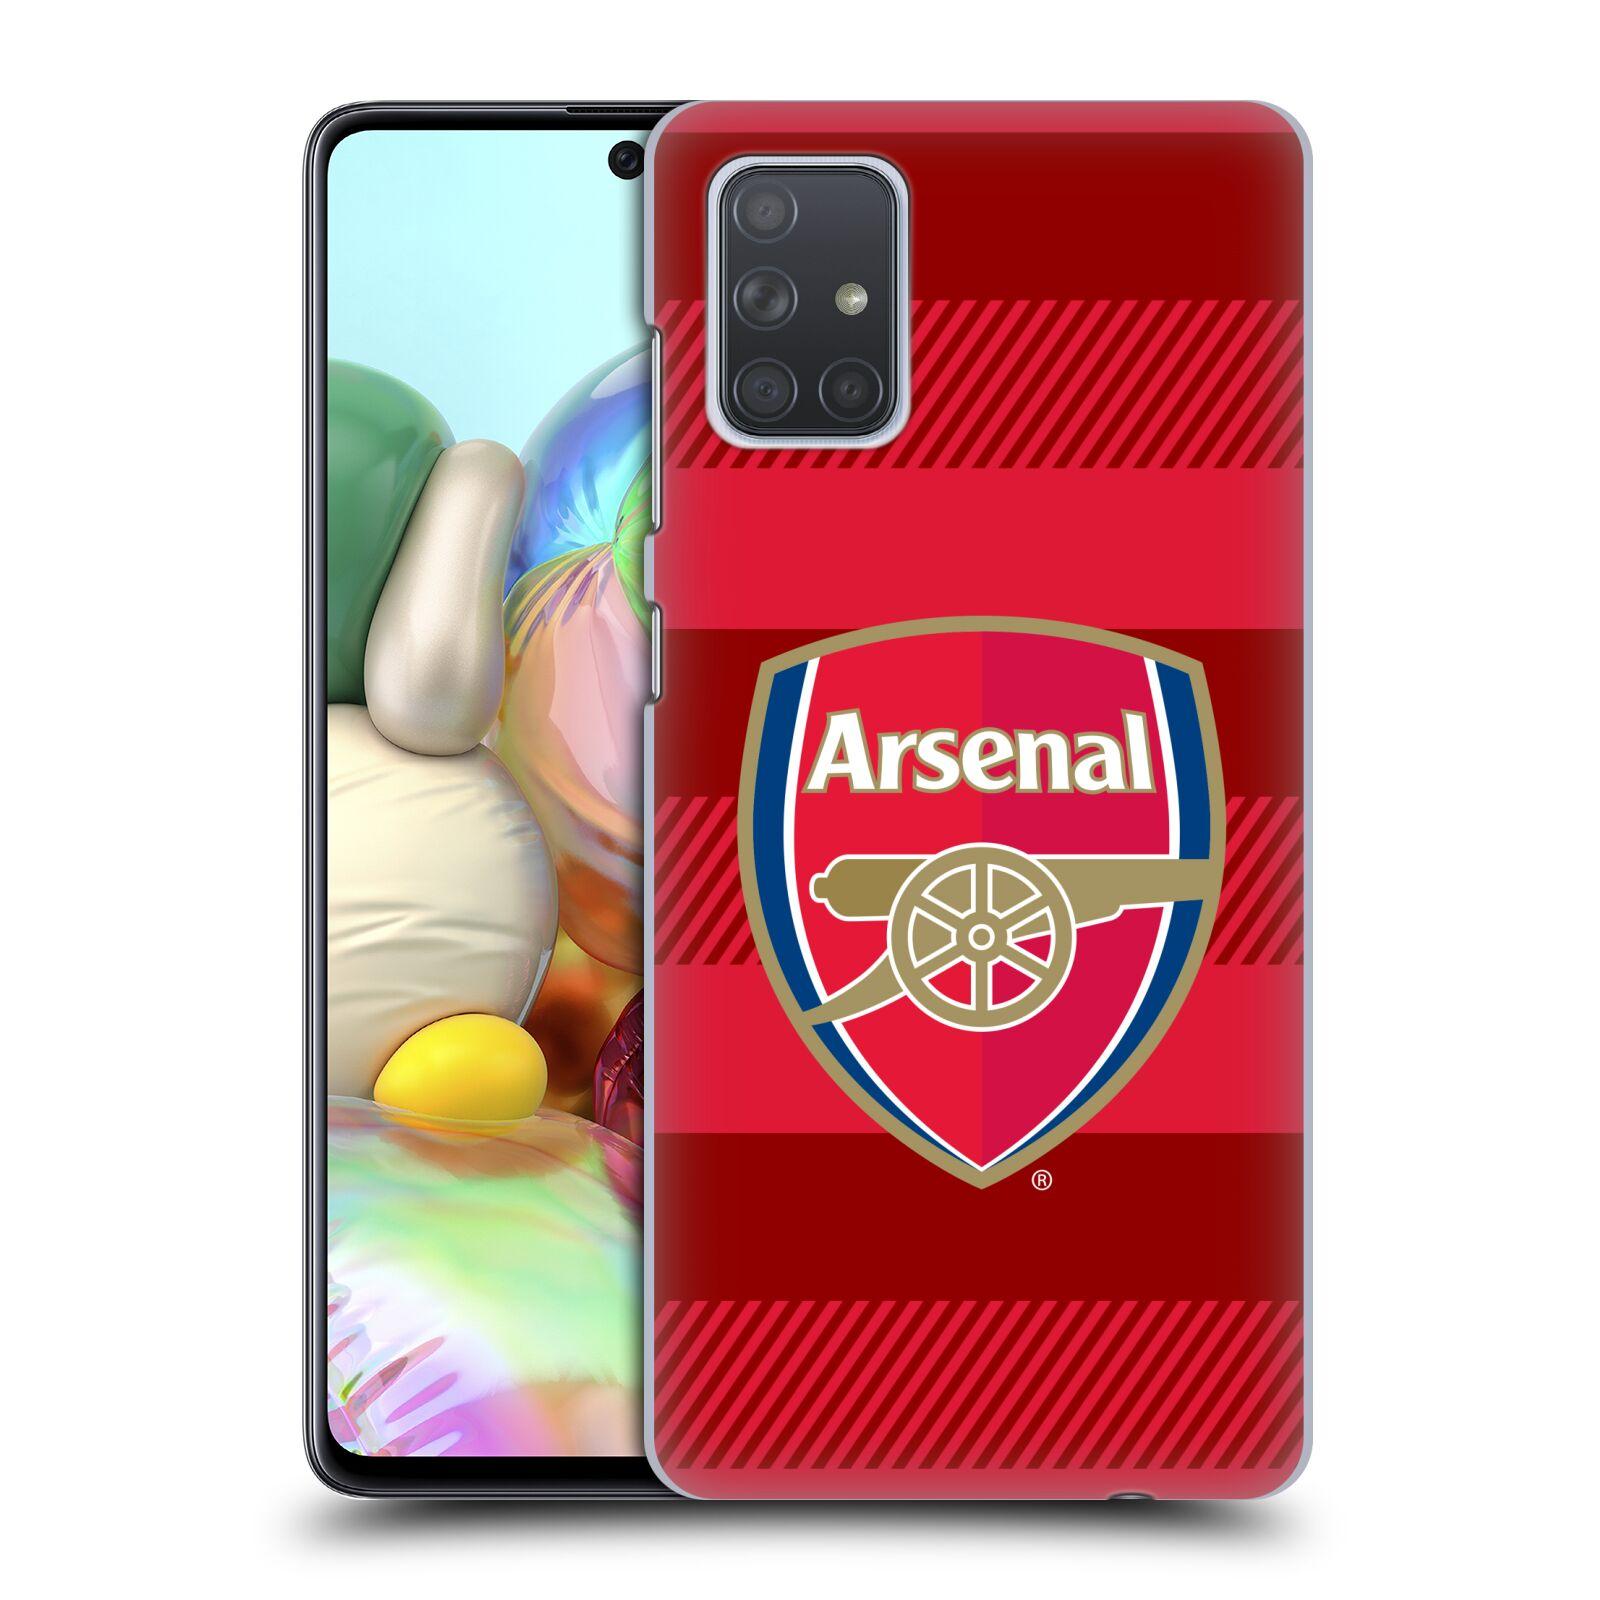 Plastové pouzdro na mobil Samsung Galaxy A71 - Head Case - Arsenal FC - Logo s pruhy